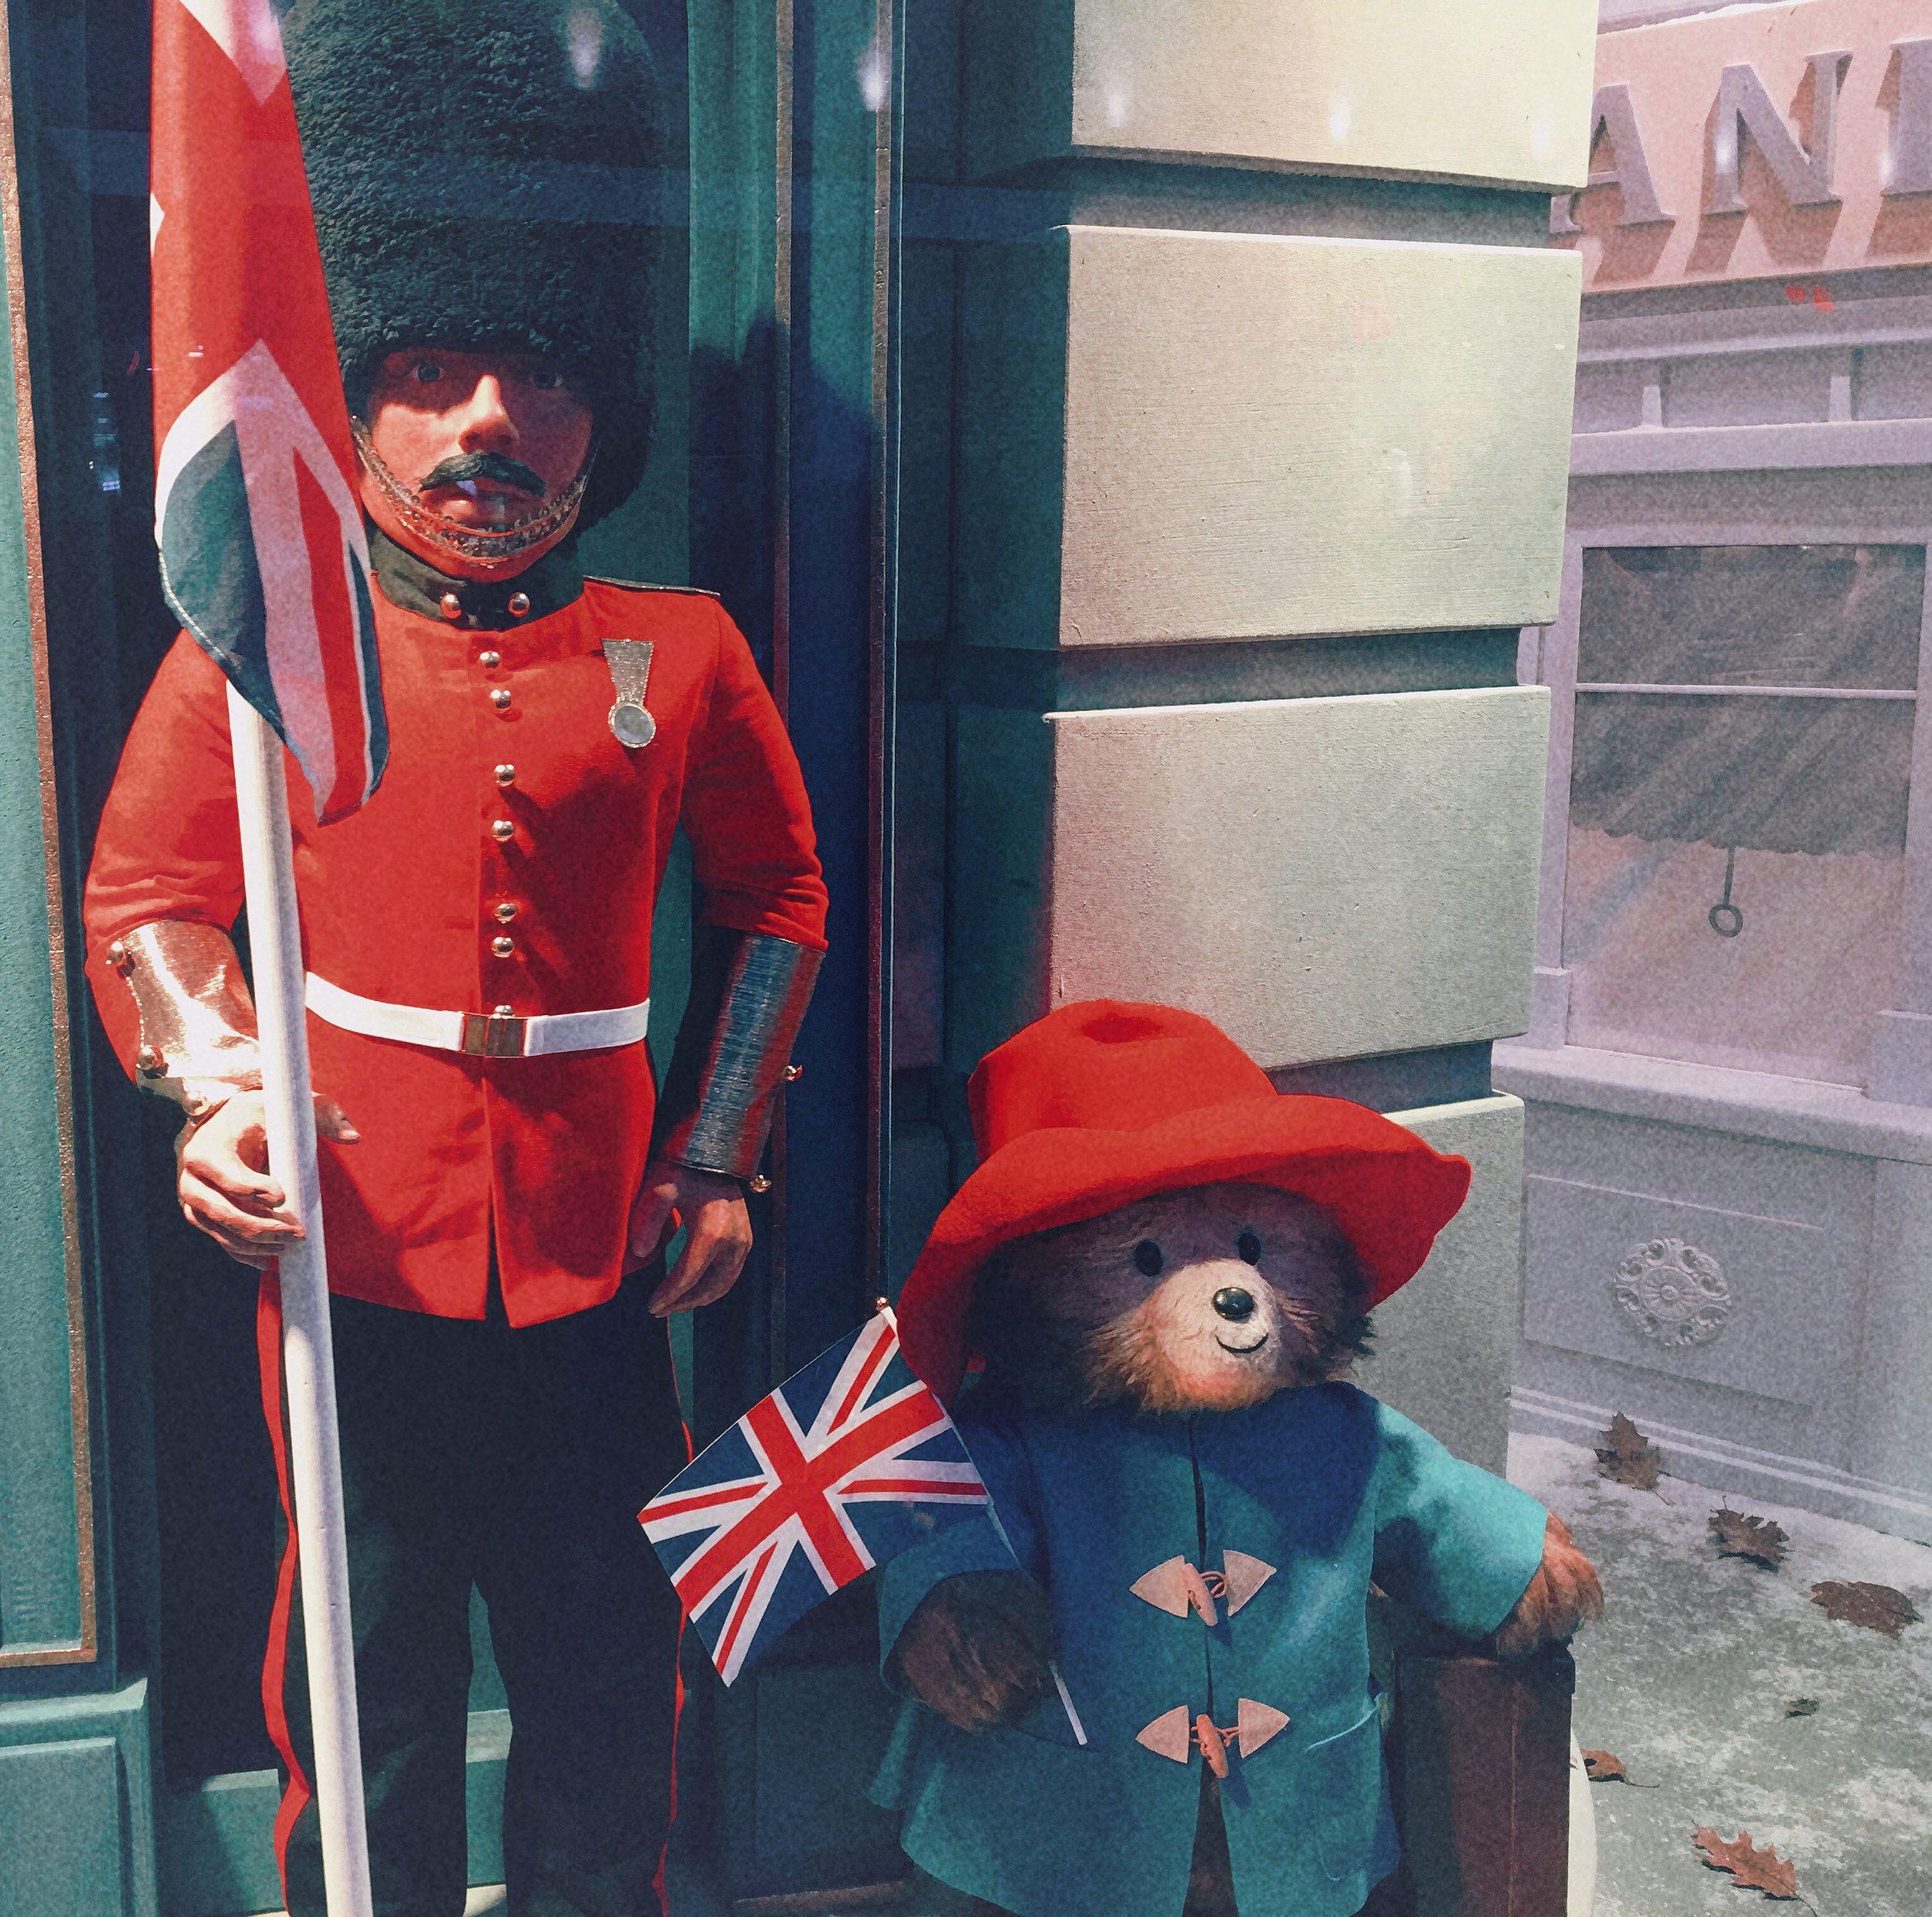 Paddington Bear English Palace Guard United Kingdom Fenwick Department Store Christmas Window